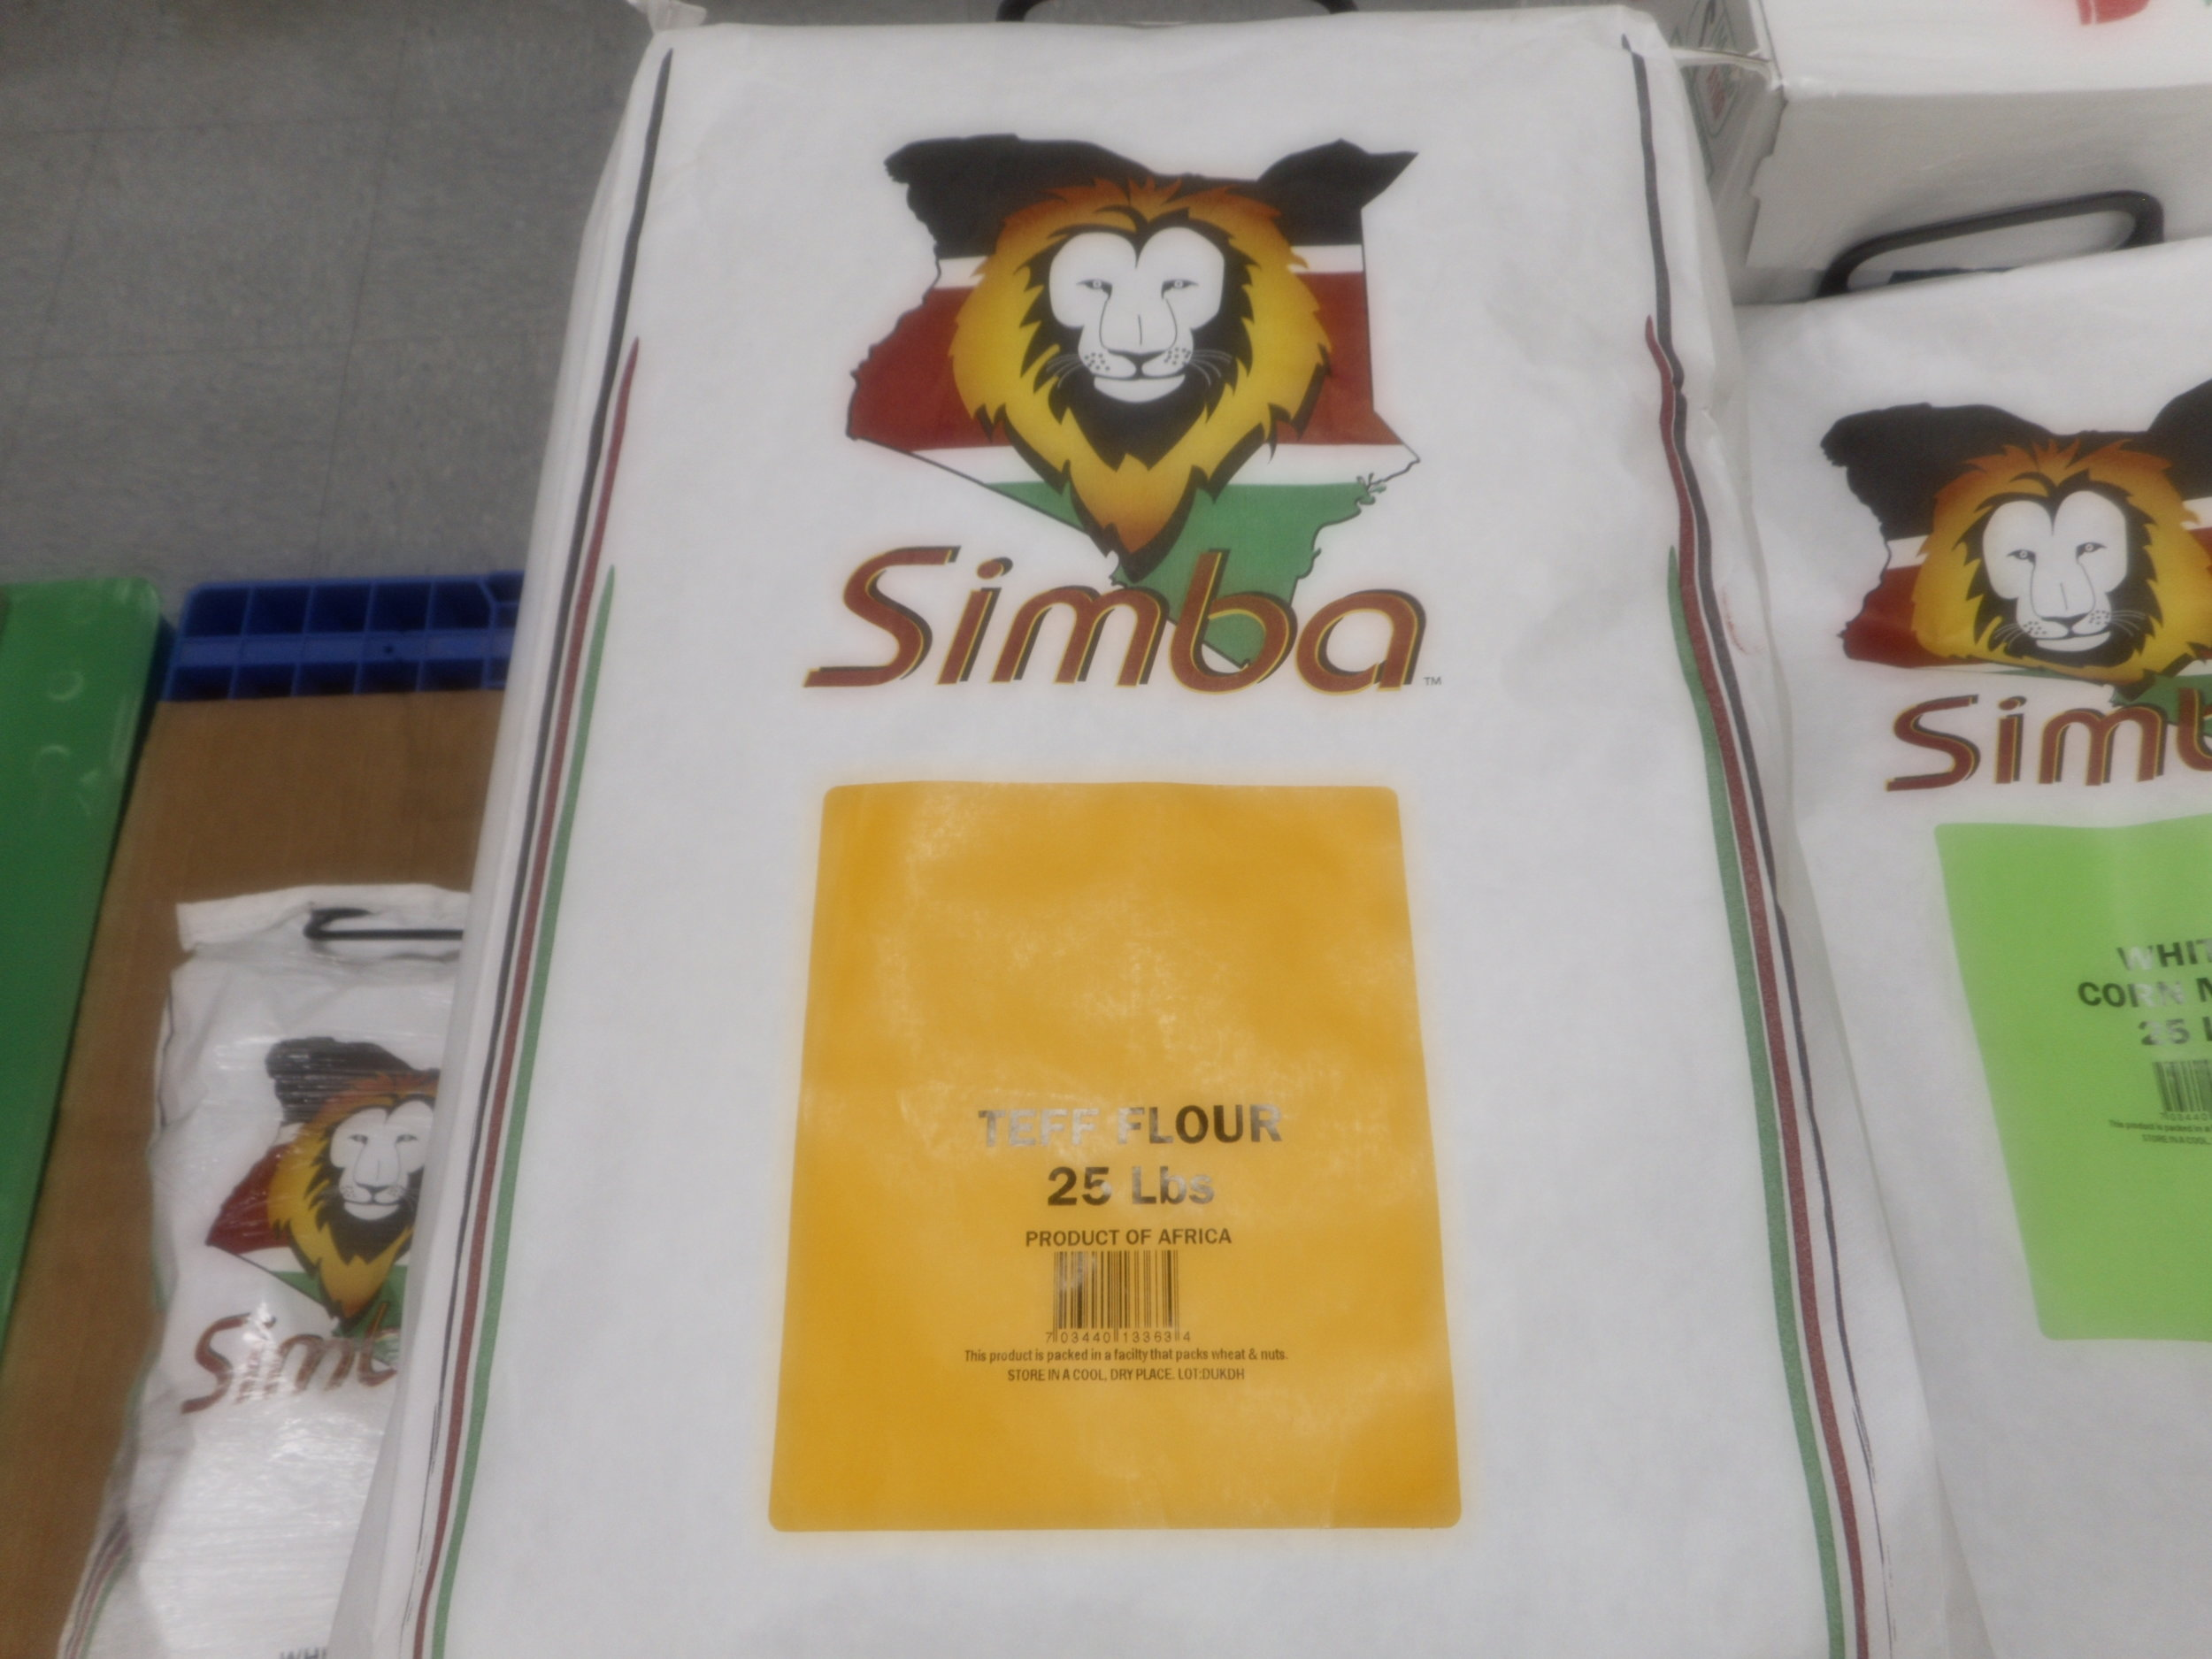 Simba-Teff-Flour-Pak-Halal-Mediterranean- Grocery-Store-12259-W-87th-St-Pkwy-Lenexa-KS-66215.JPG